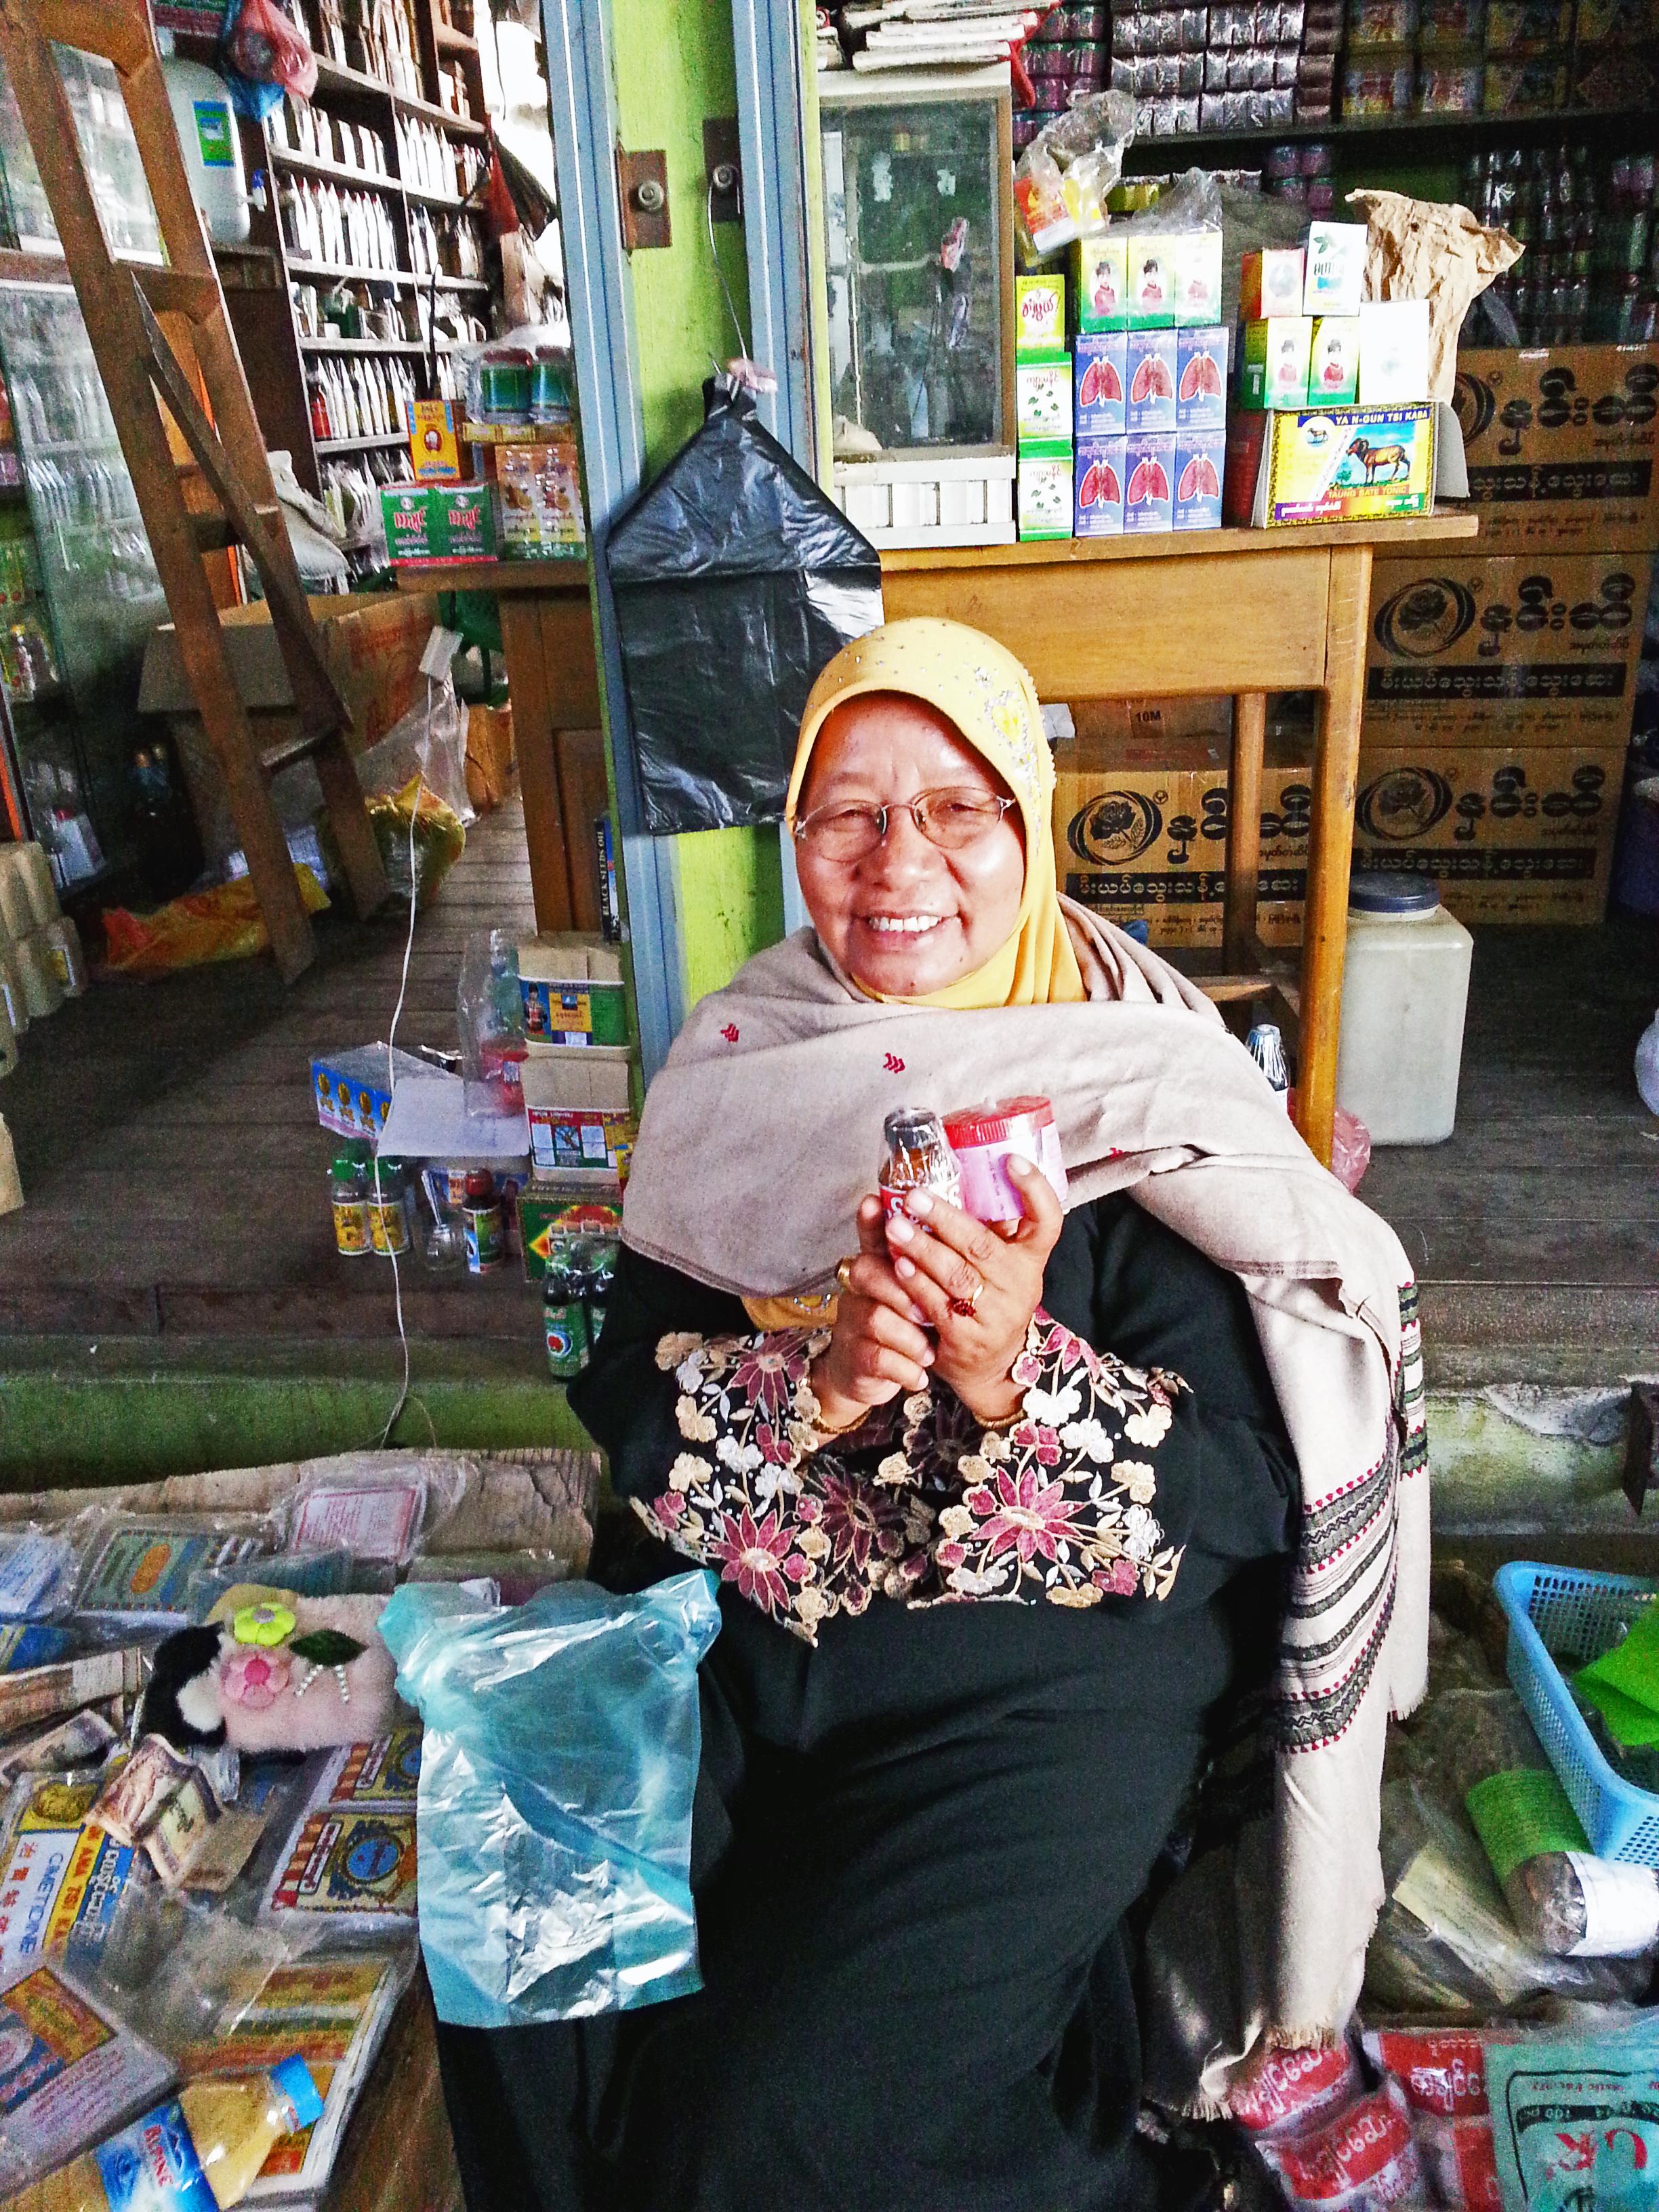 Medicine vendor